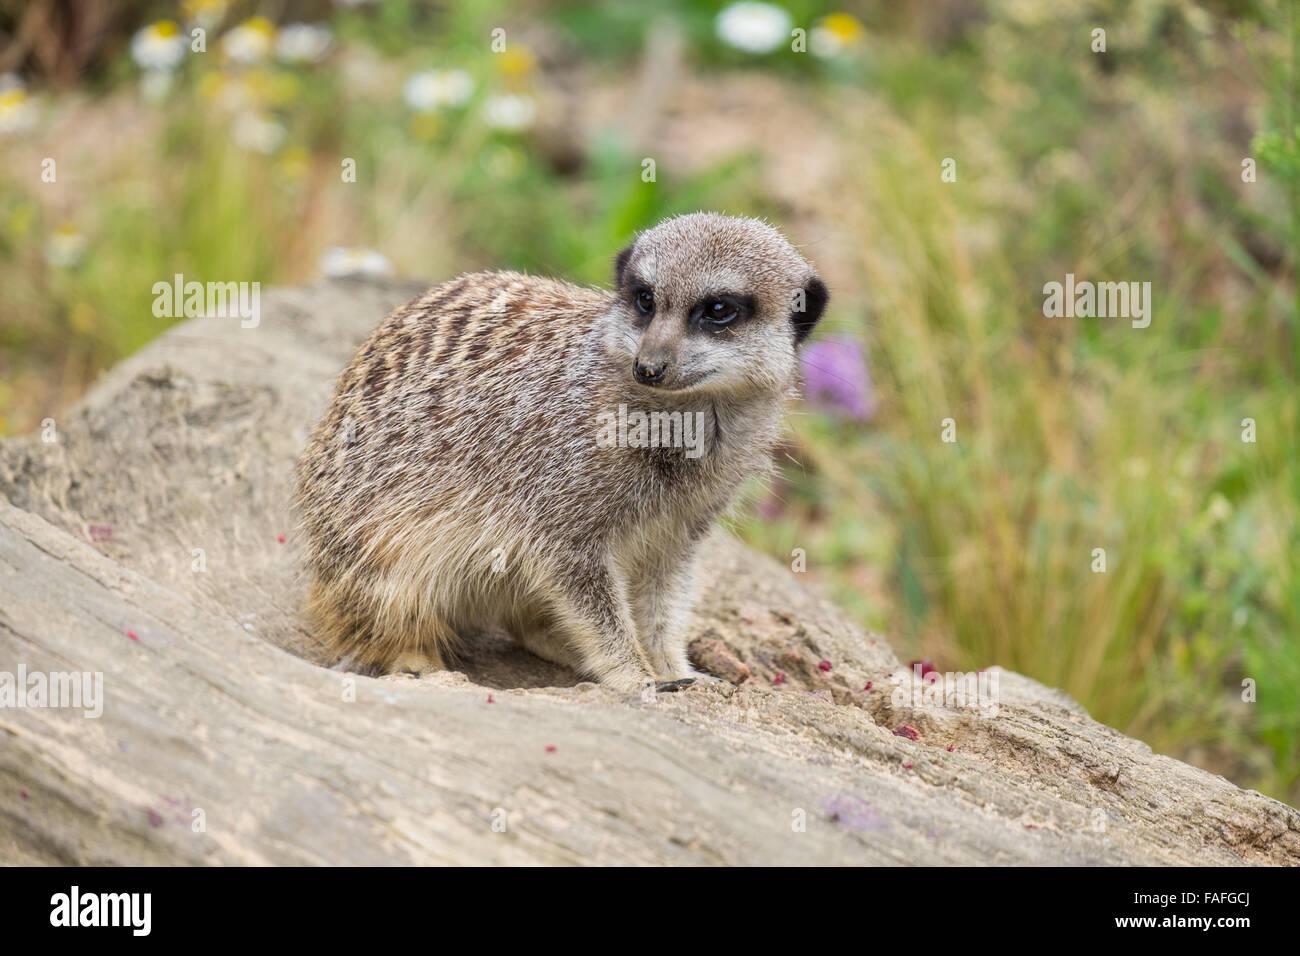 Meercat on Log - Stock Image